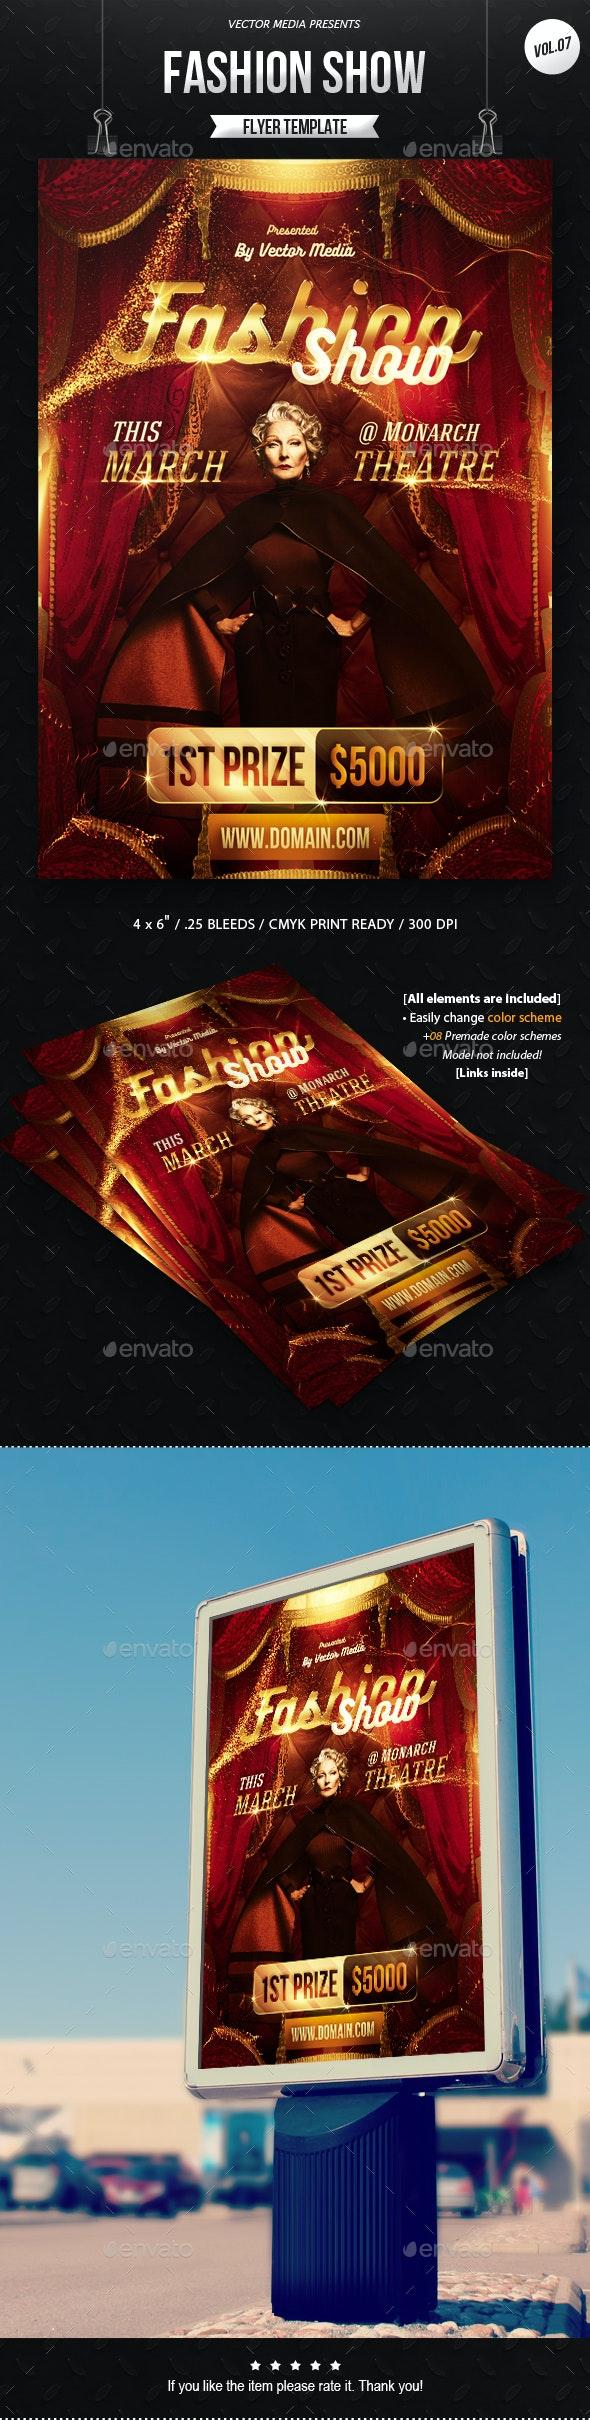 Fashion Show - Flyer [Vol.07] - Miscellaneous Events